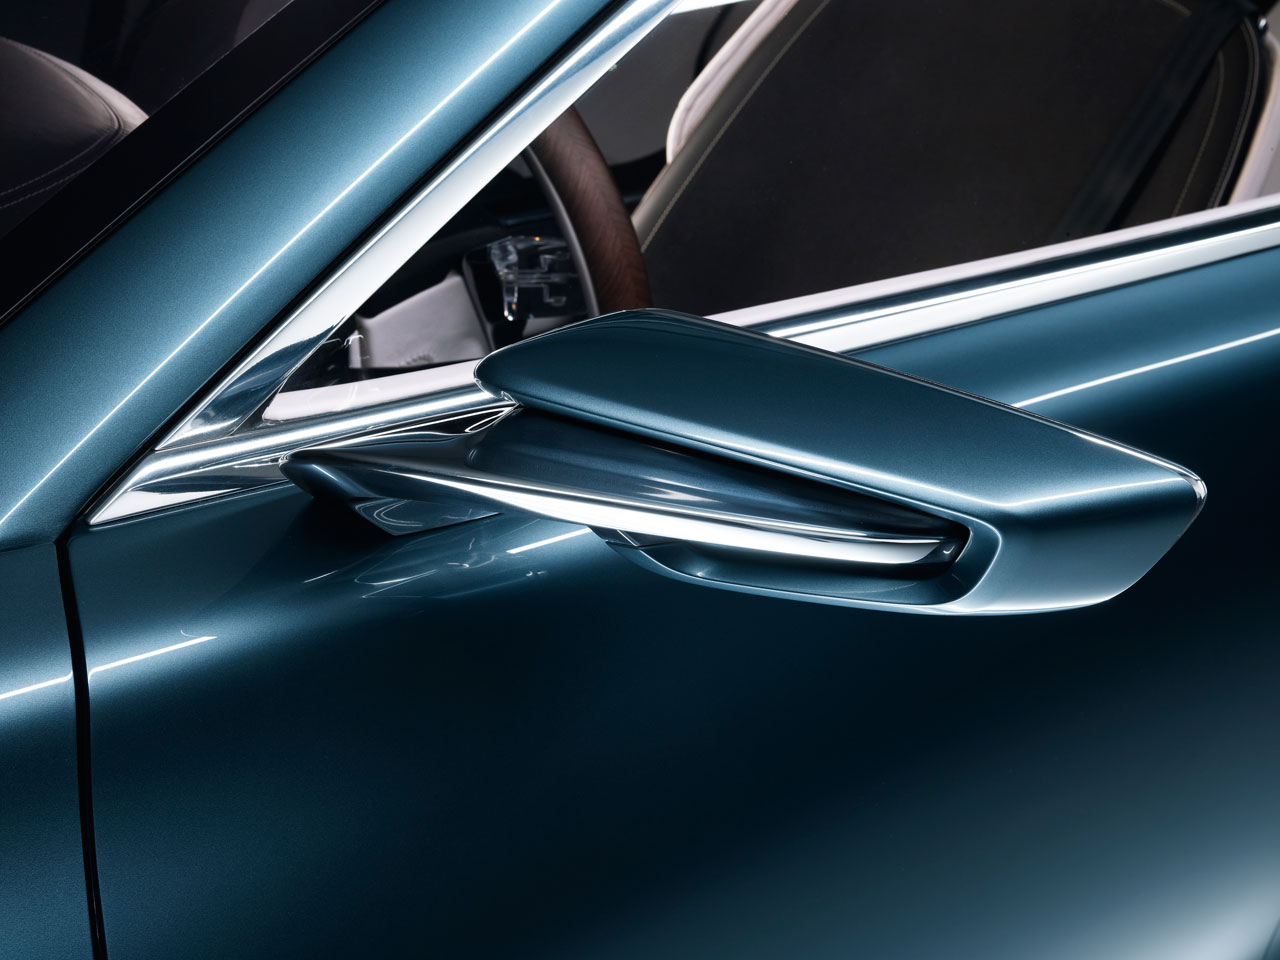 volvo concept you side mirror car body design. Black Bedroom Furniture Sets. Home Design Ideas